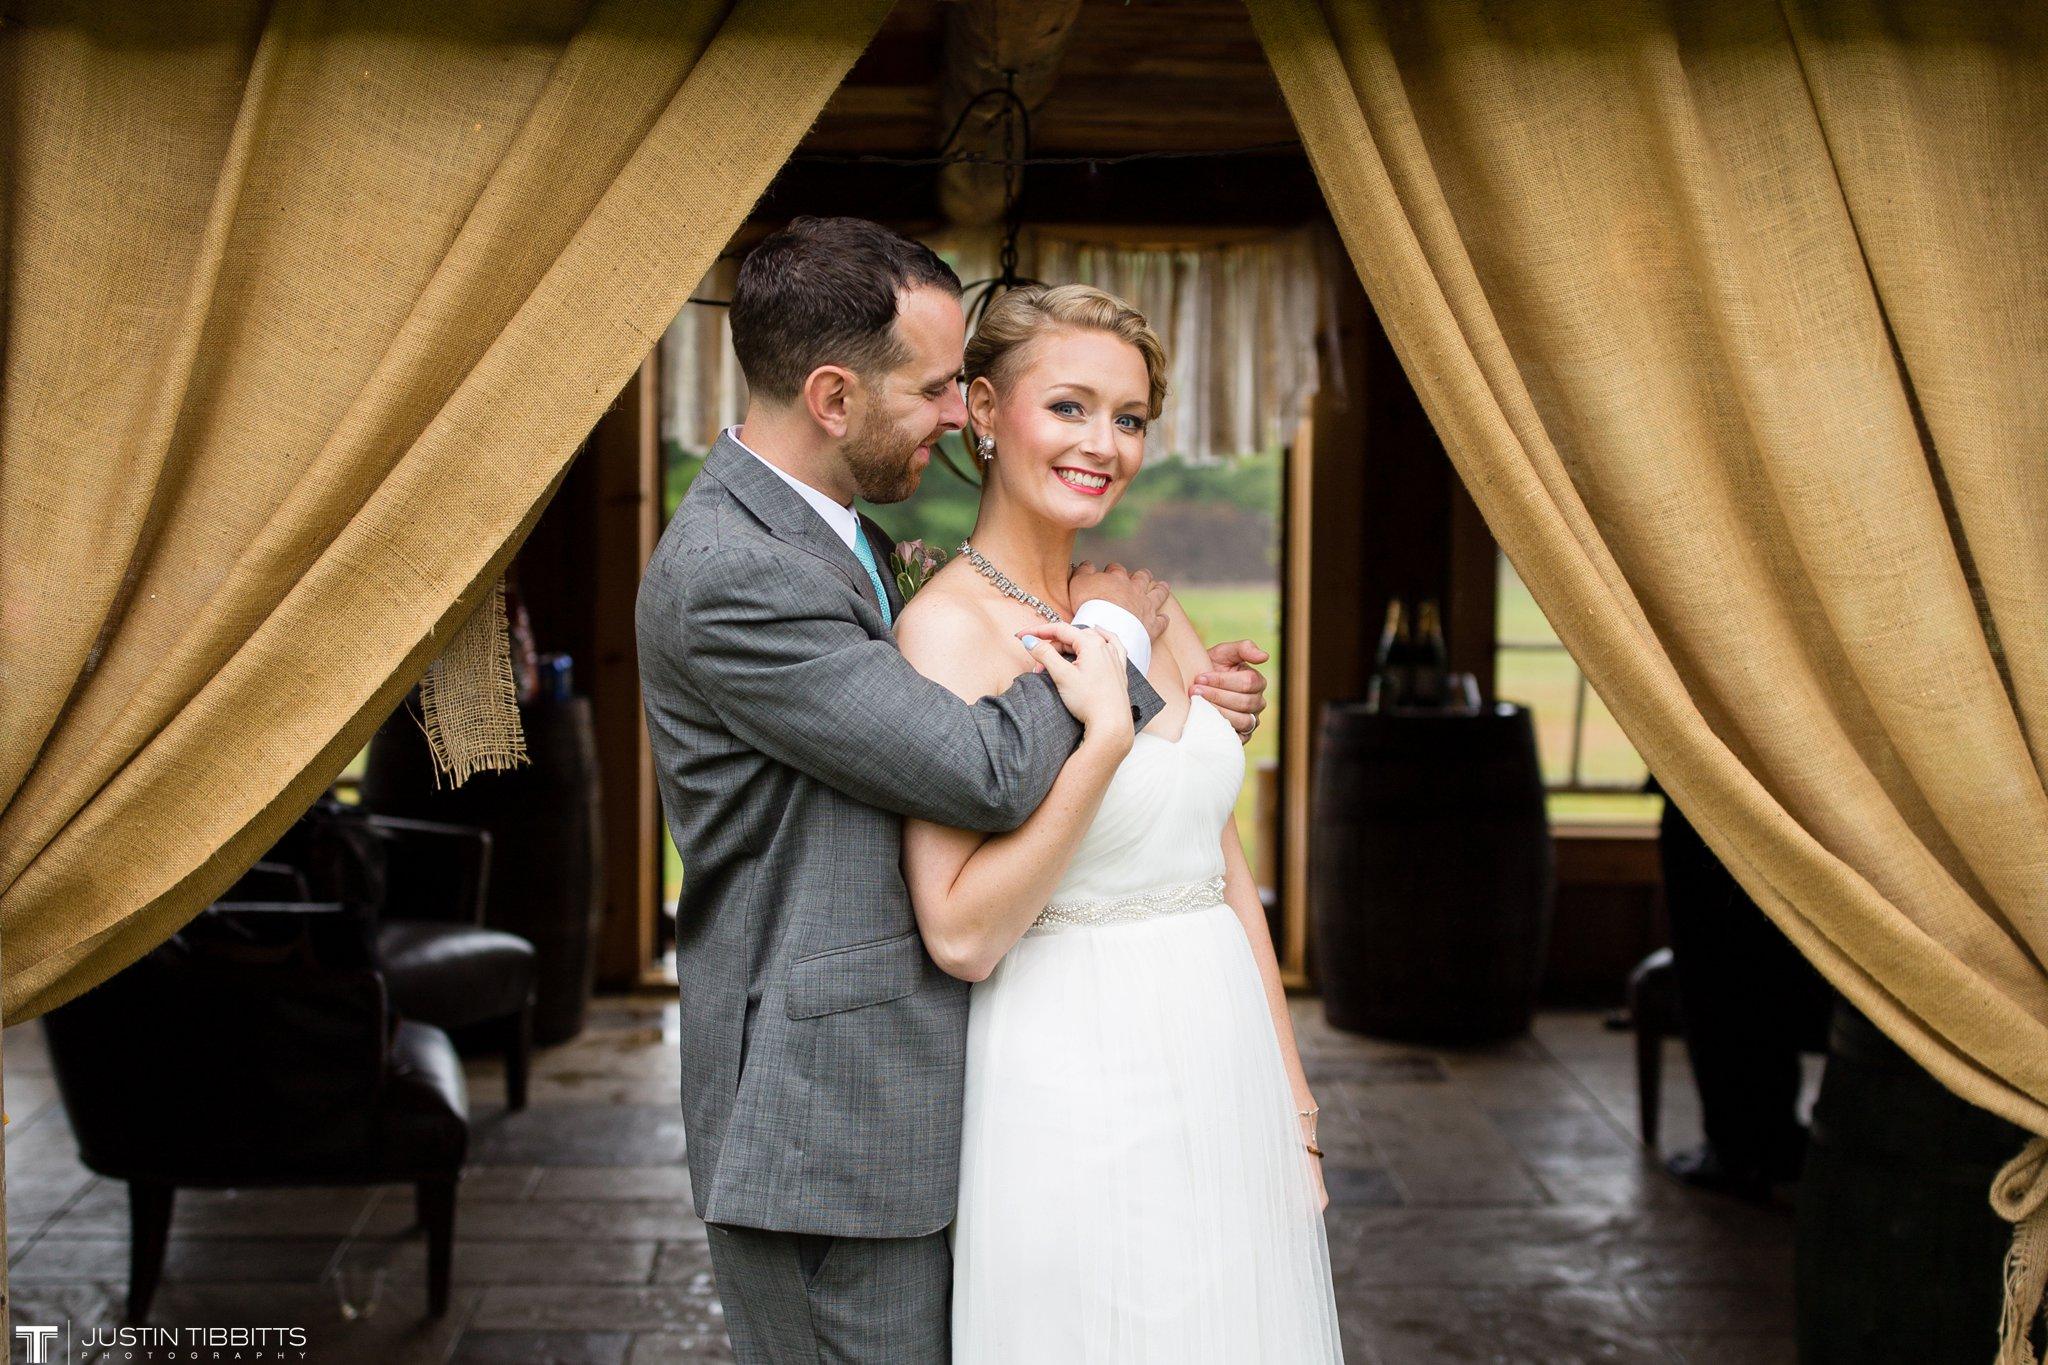 burlap-and-beams-wedding-photos-with-joran-and-molly_0089